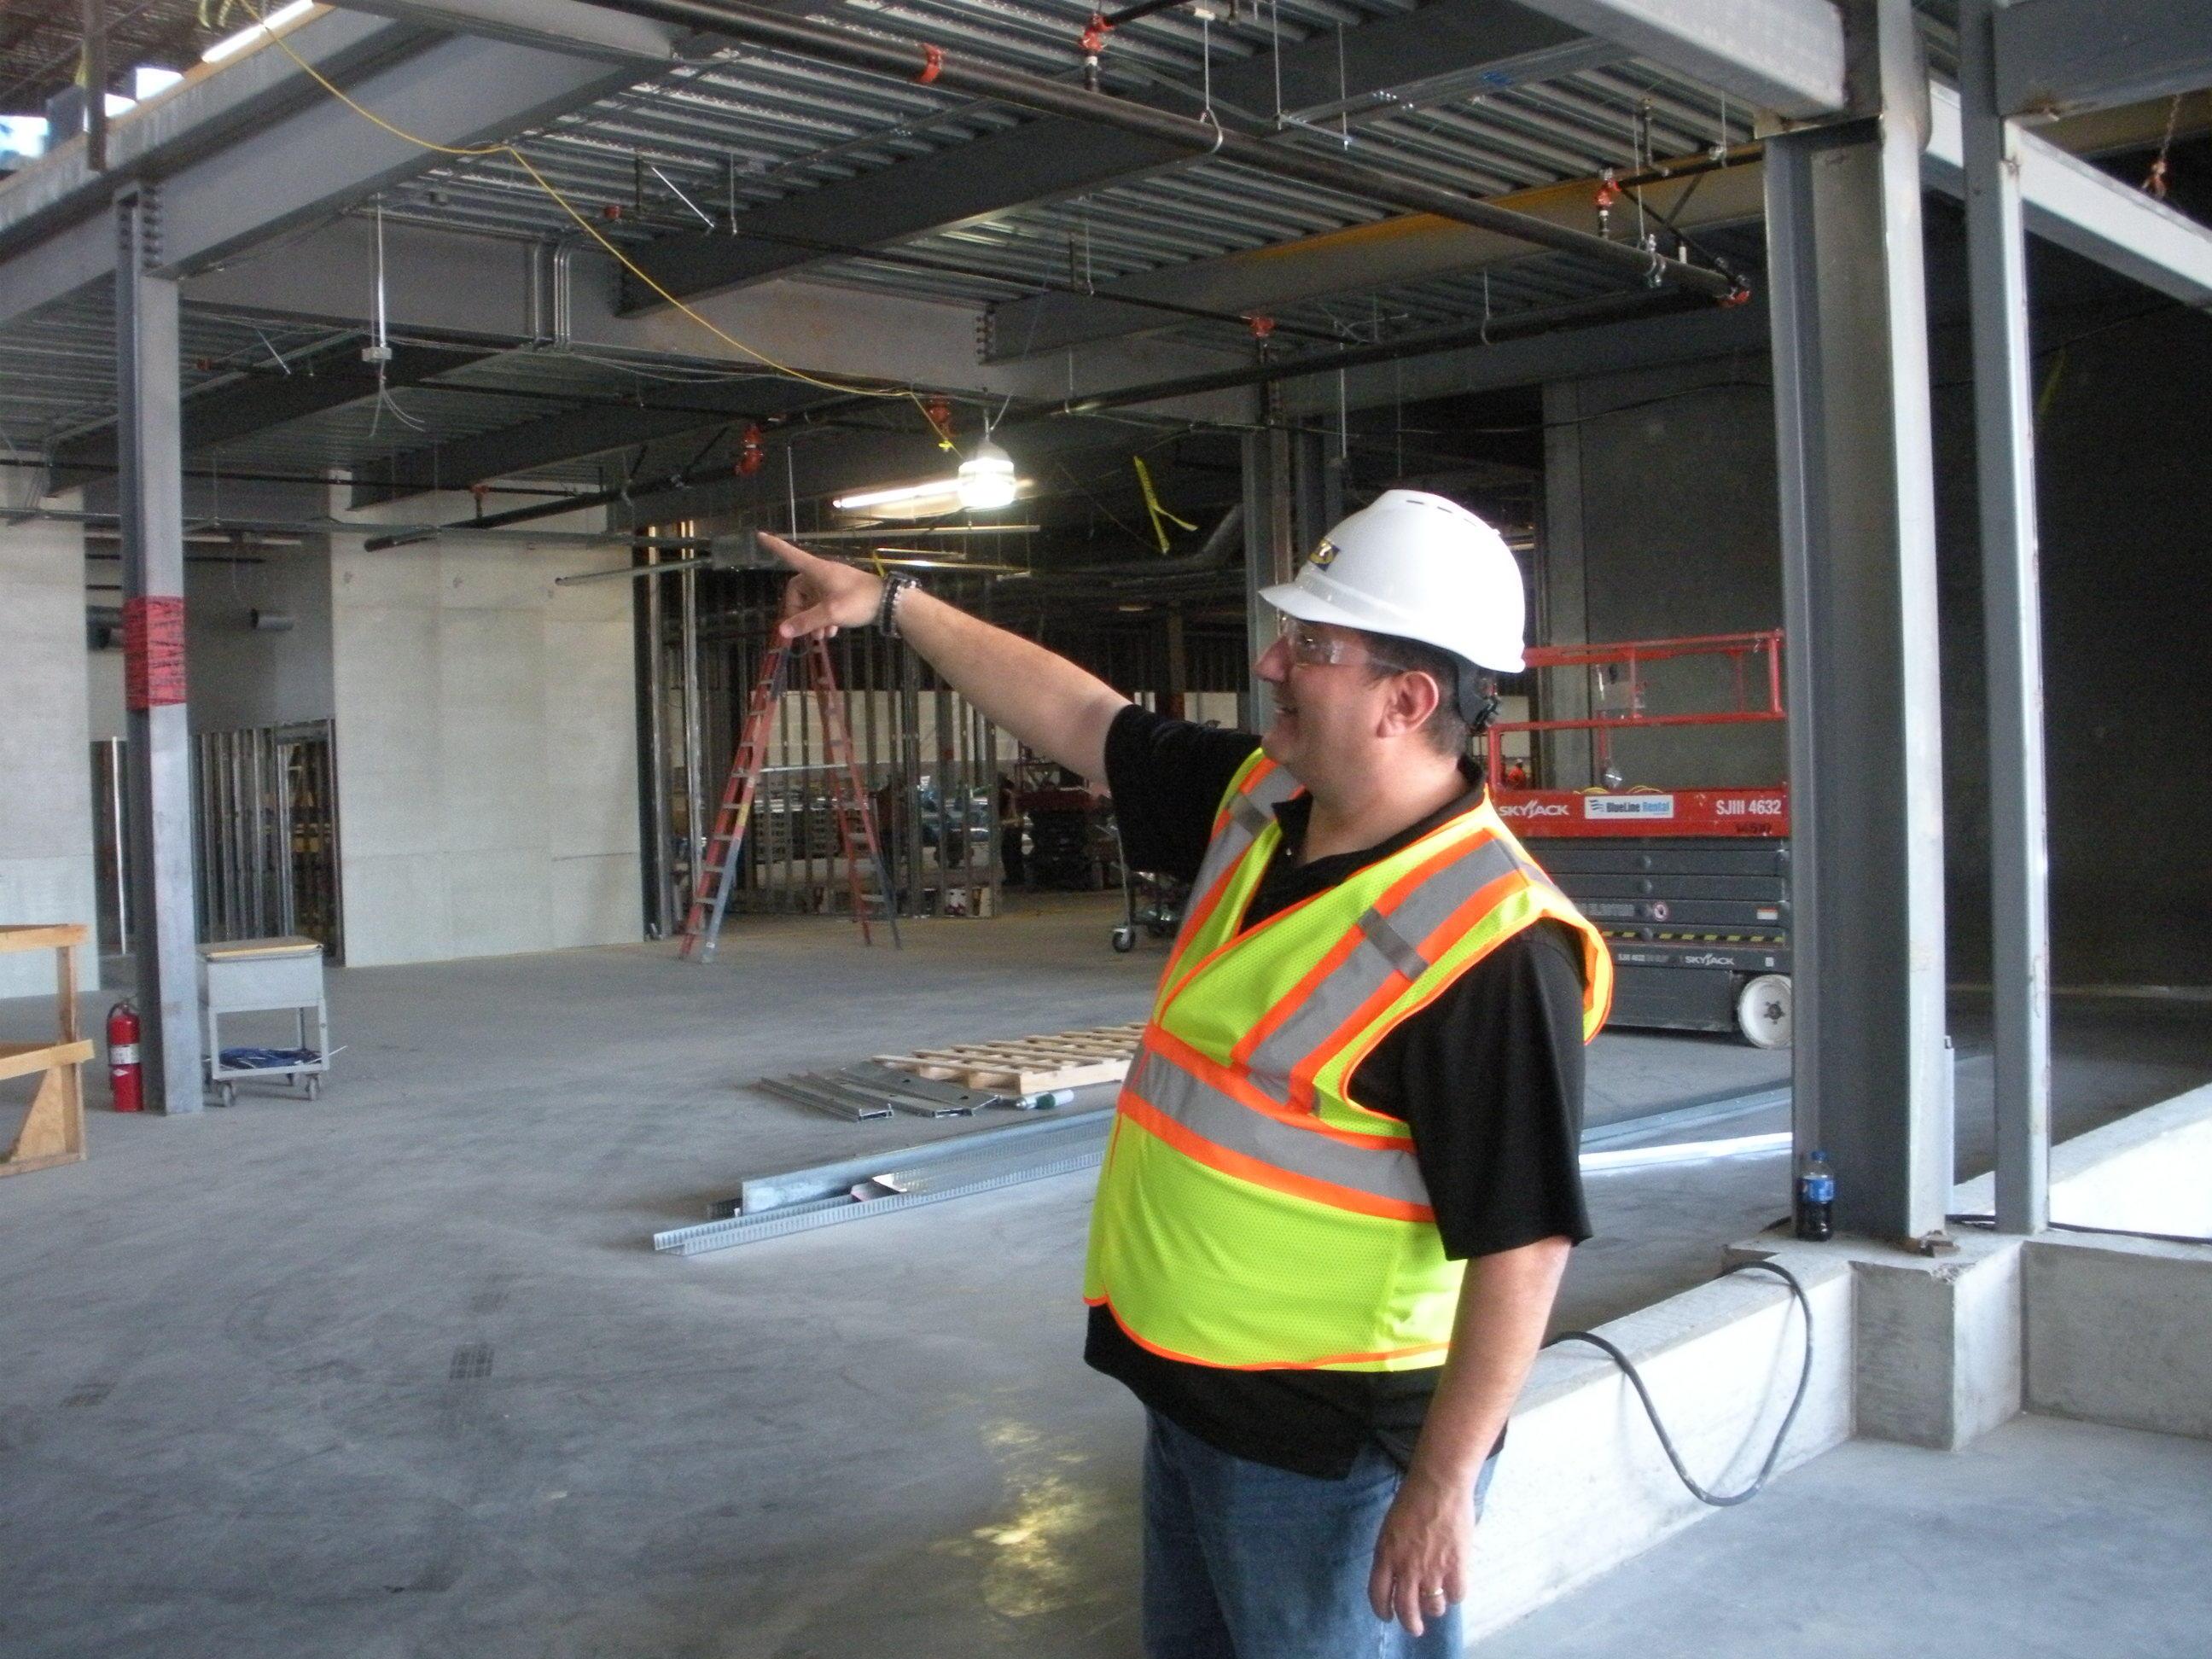 Ikea Appoints John Achillea To Manage Future St Louis Store